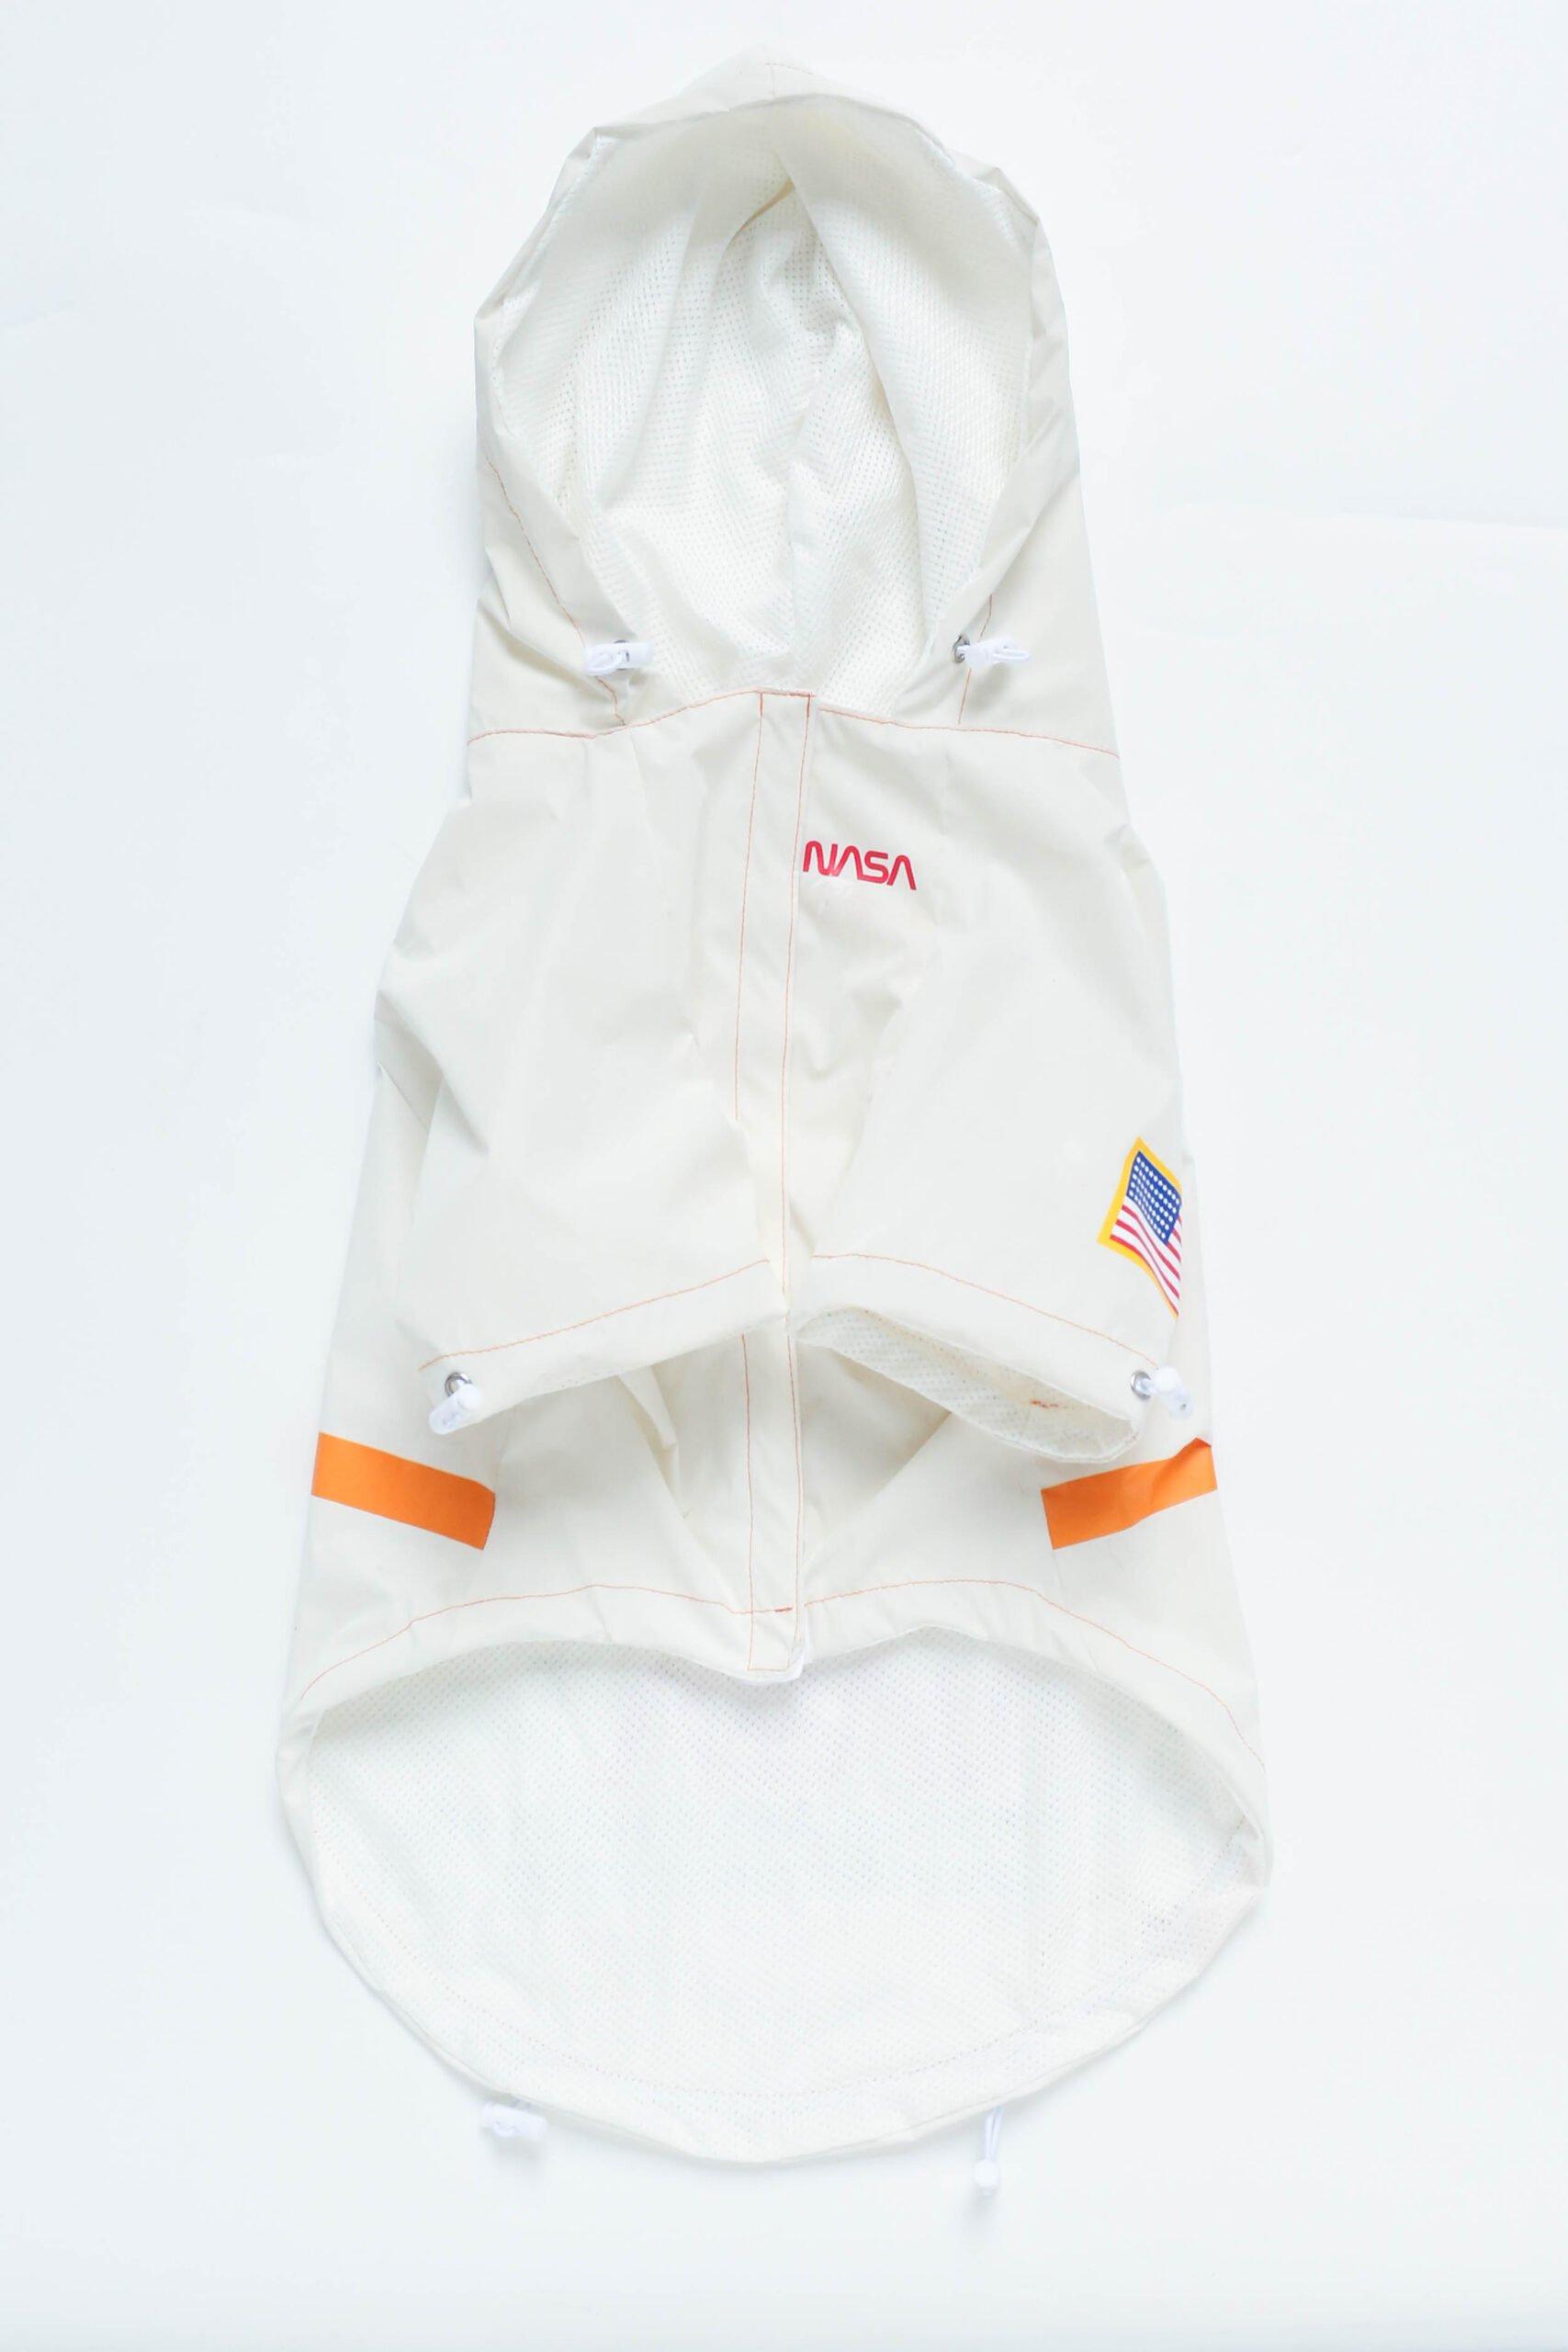 NASA Reflective Dog Safety Jacket